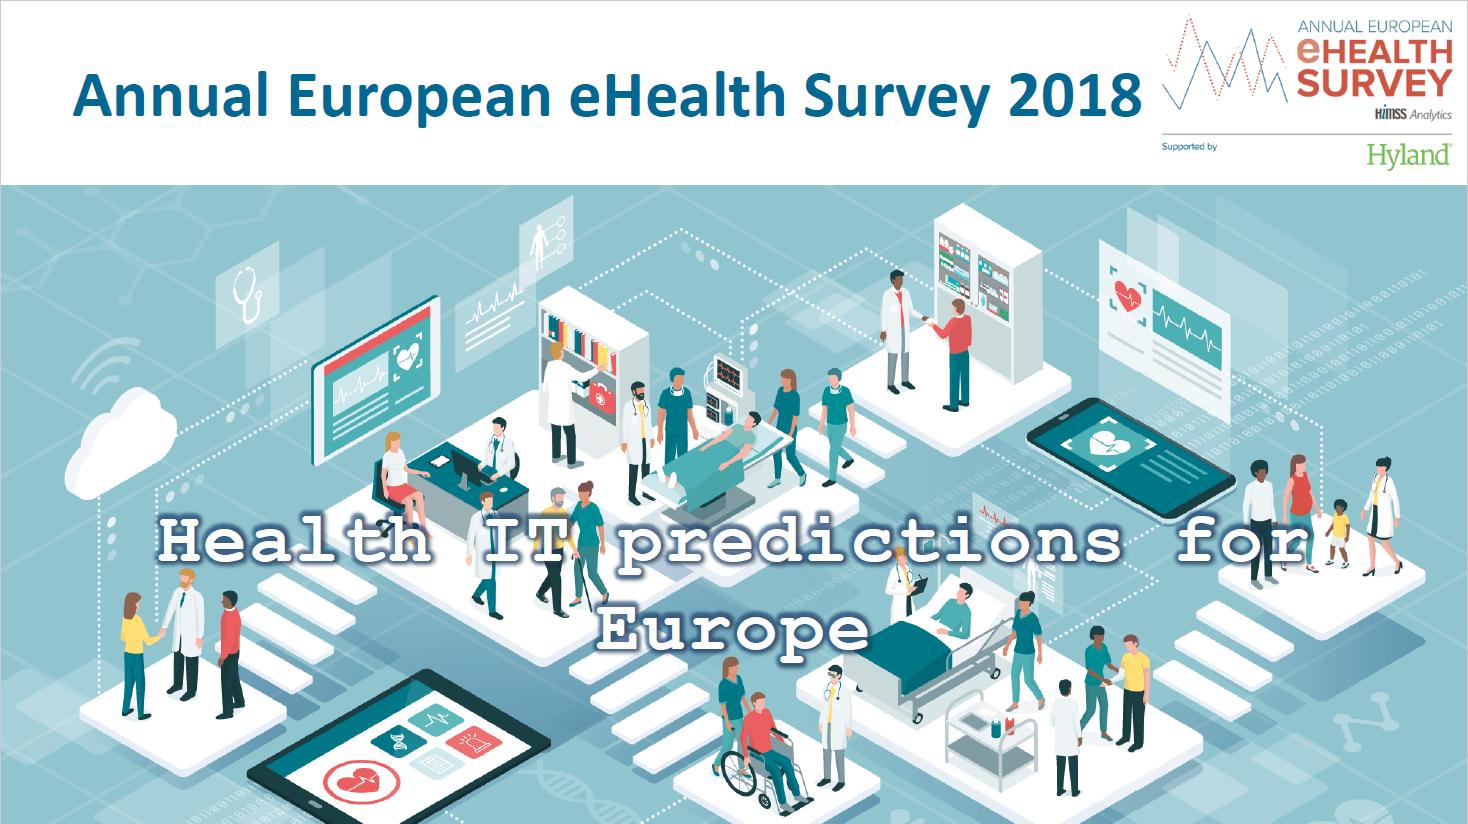 HIMSS Annual European eHealth Analytics 2018